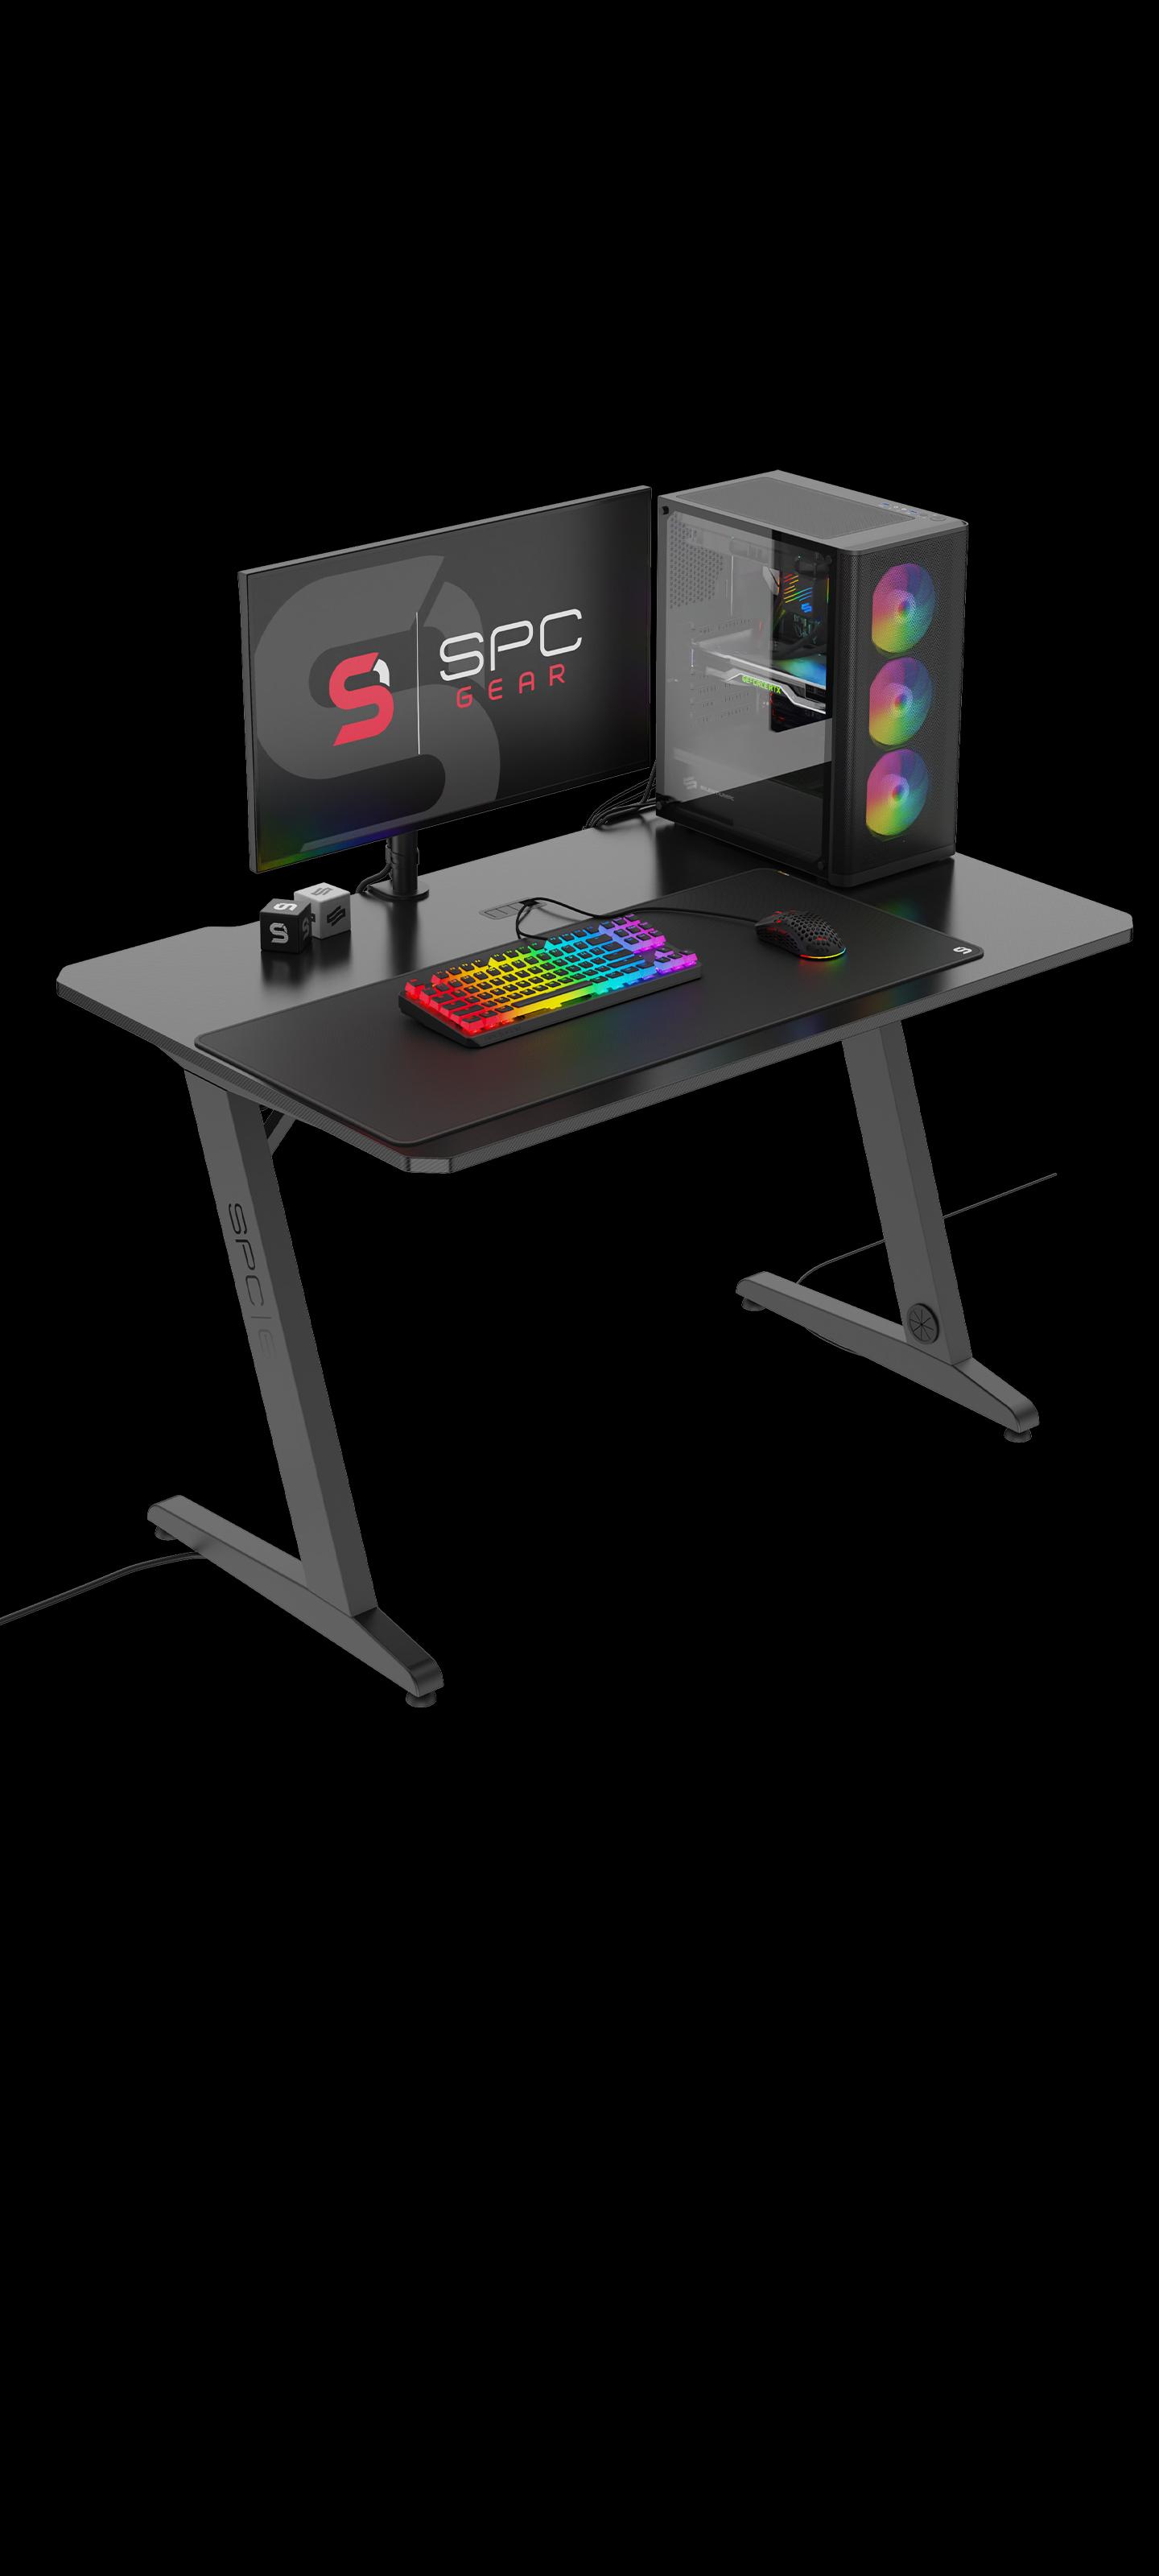 SPC Gear GD100 gaming desk